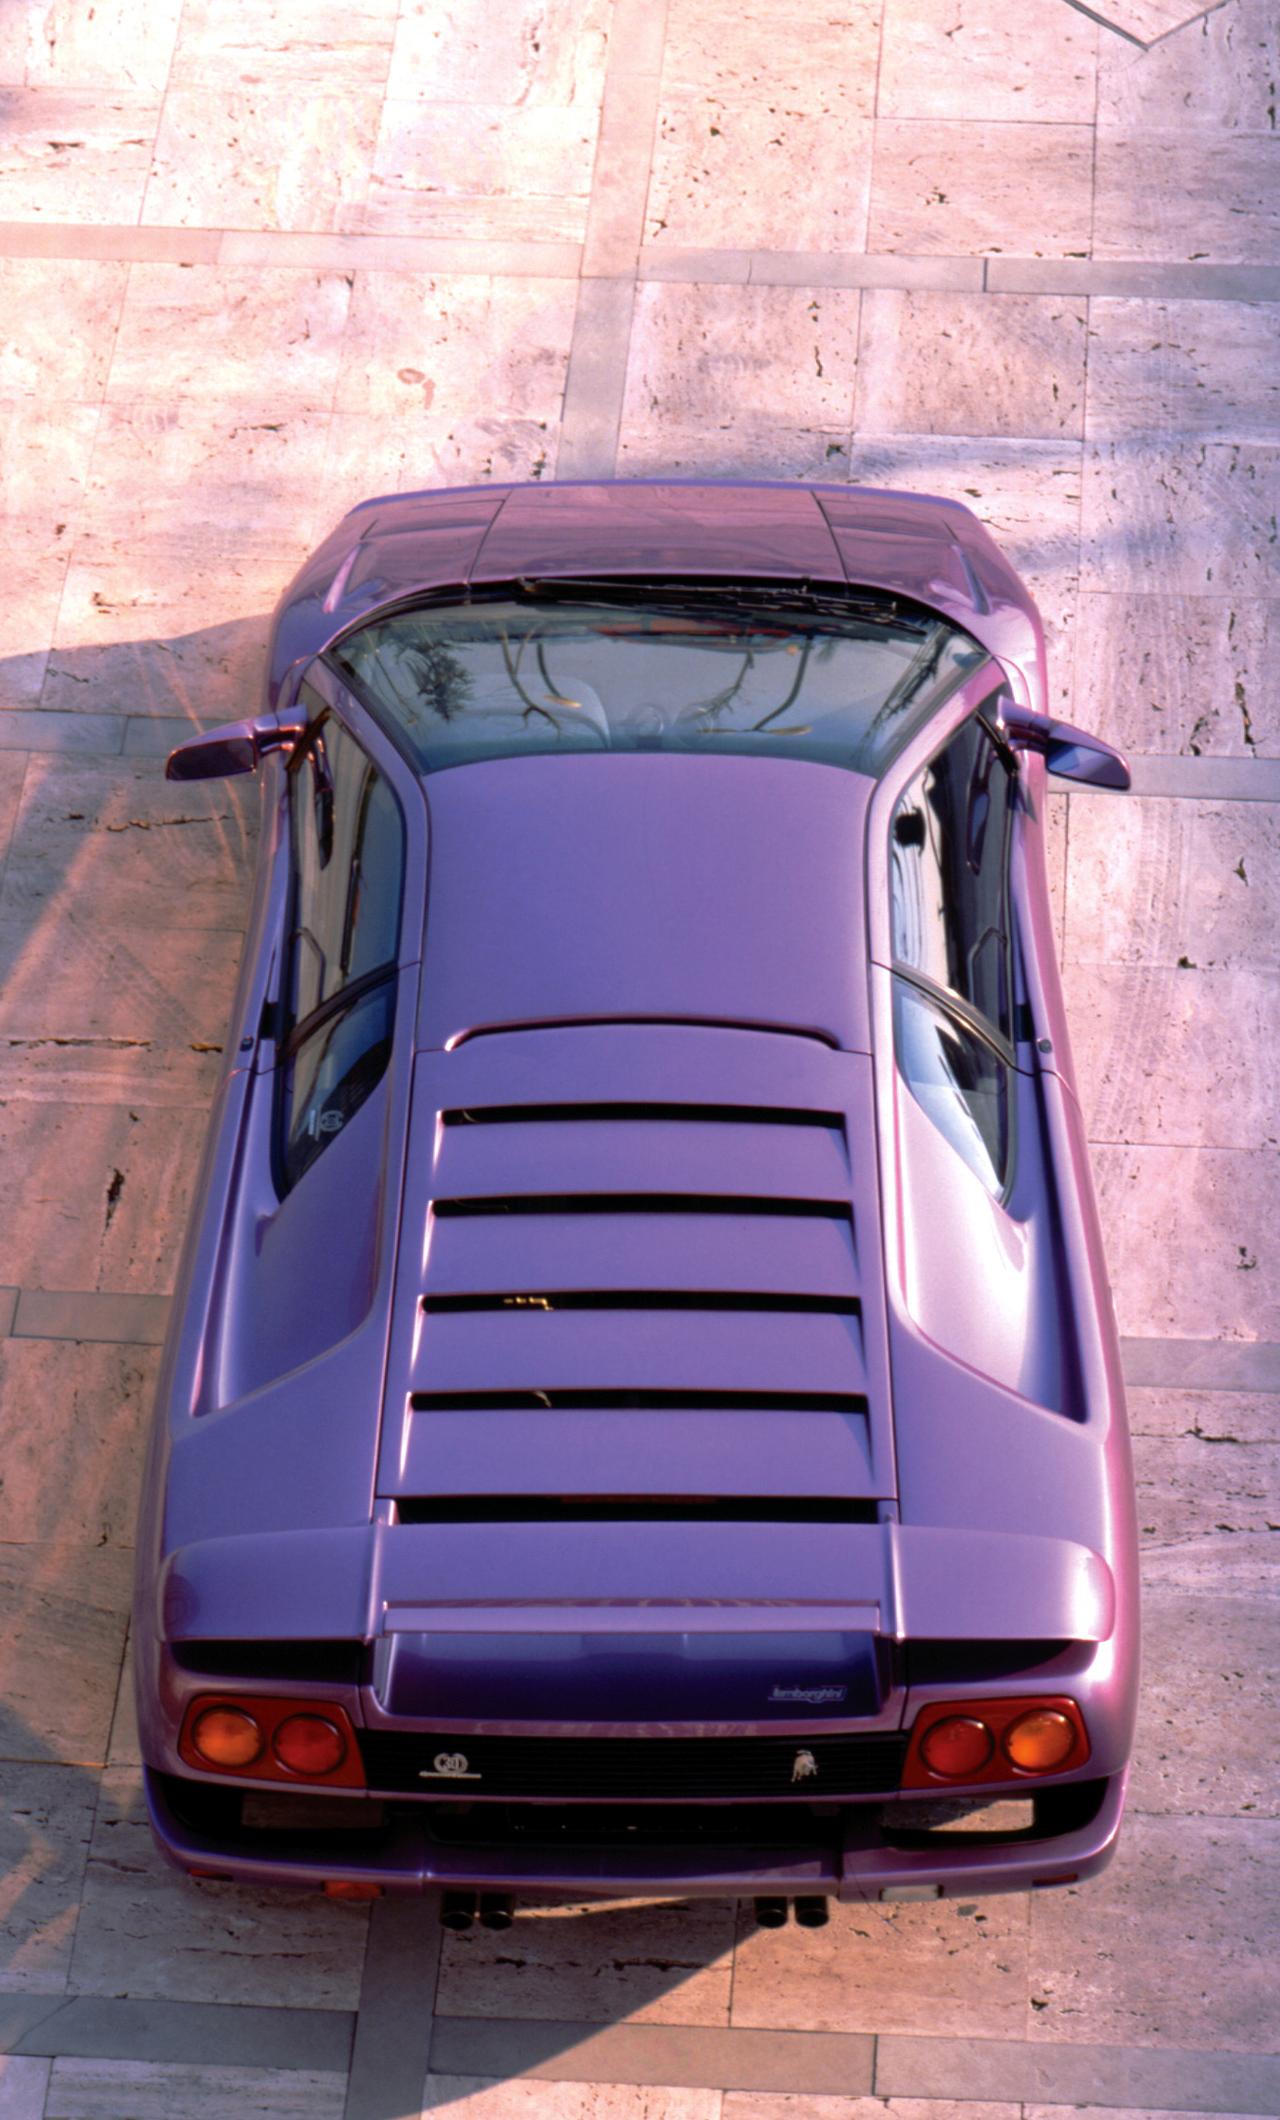 1280x2120 Lamborghini Diablo Se30 Iphone 6 Hd 4k Wallpapers Images